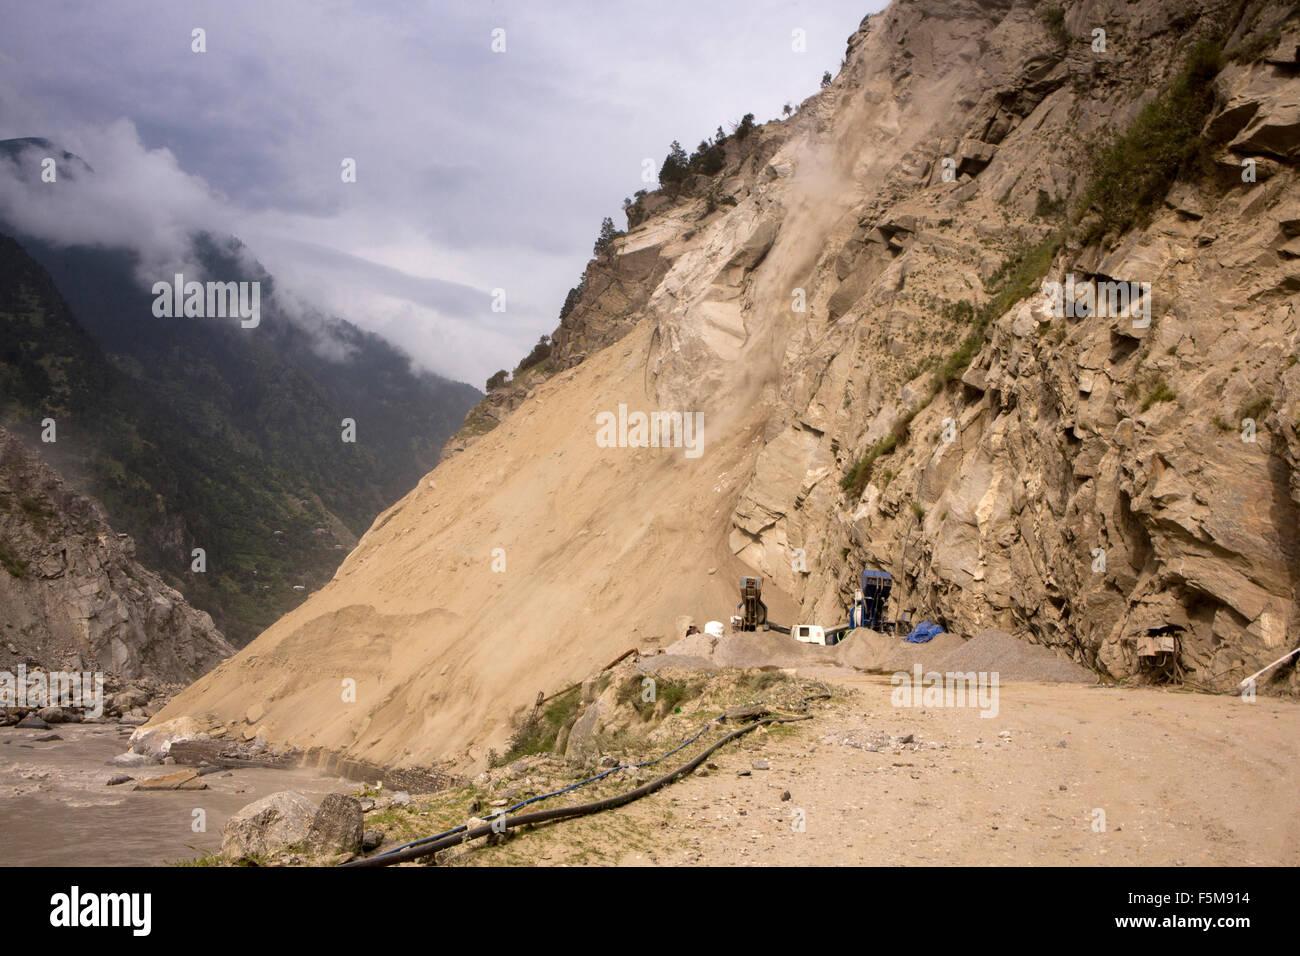 India, Himachal Pradesh, Chooling, imponente frana bloccando la Hindustan al Tibet Autostrada accanto al fiume Sutlej Immagini Stock